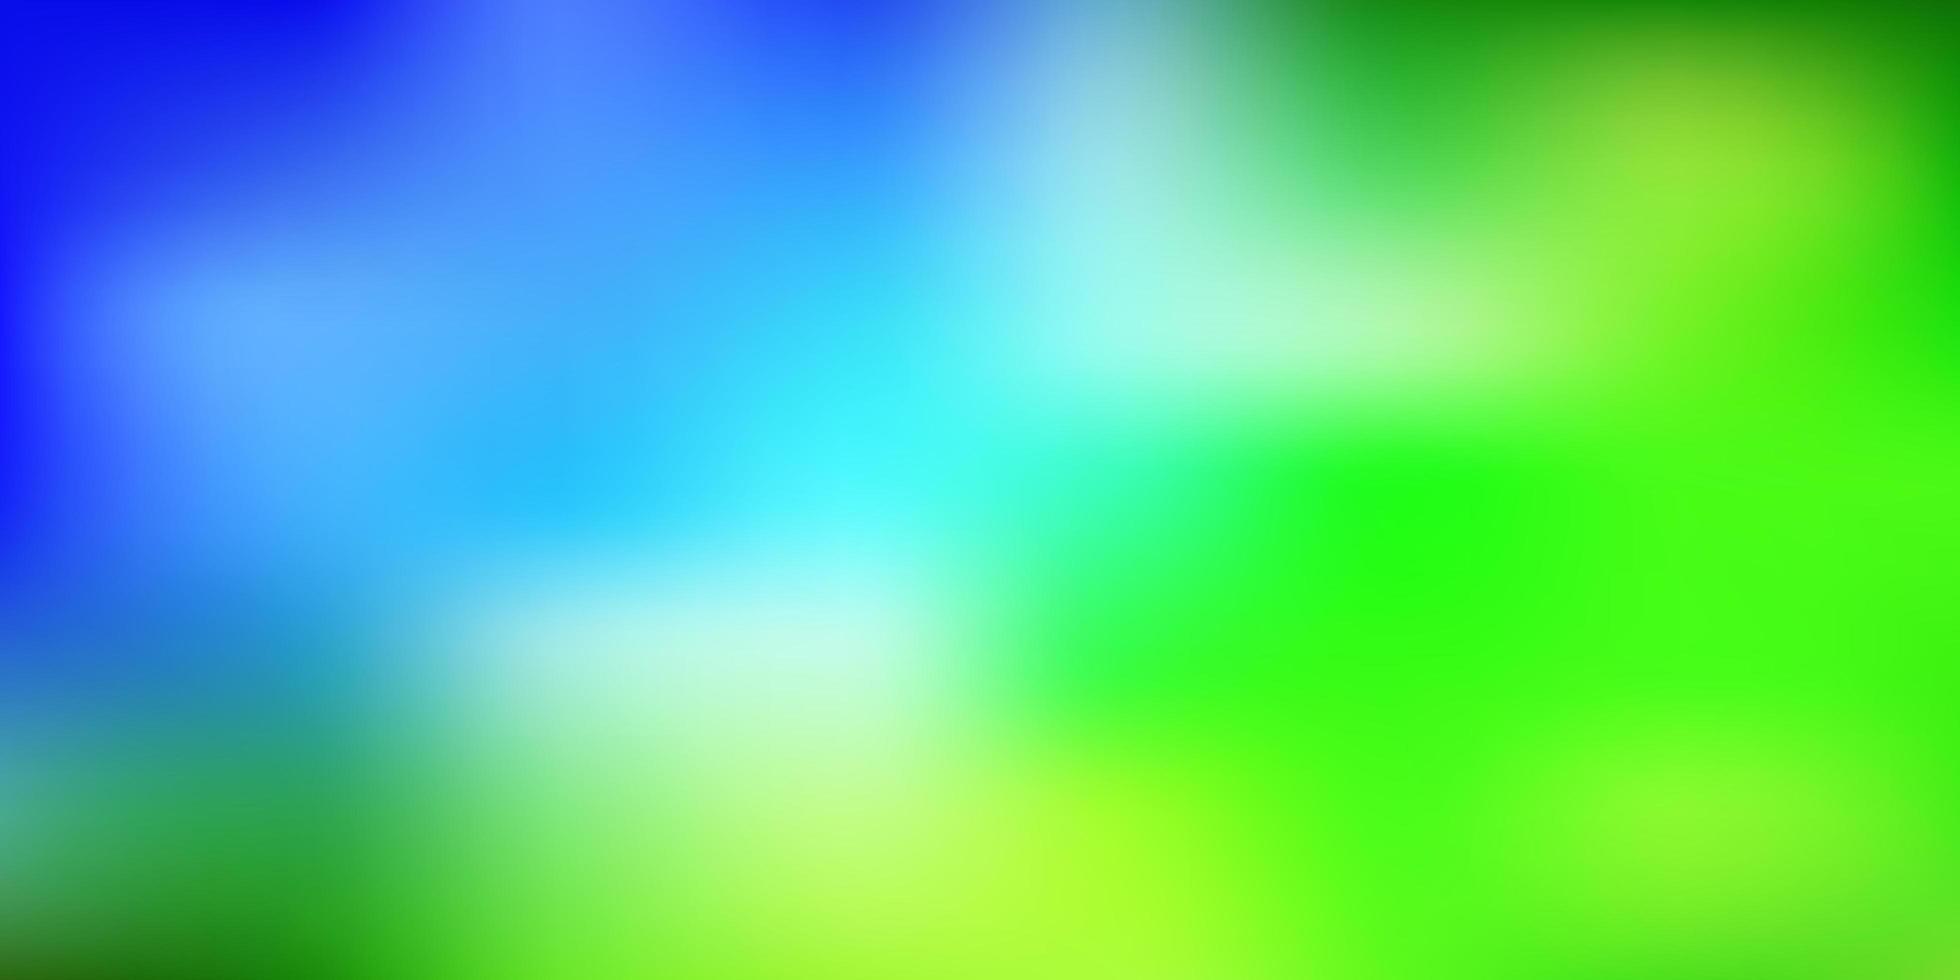 layout di sfocatura vettoriale azzurro, verde.